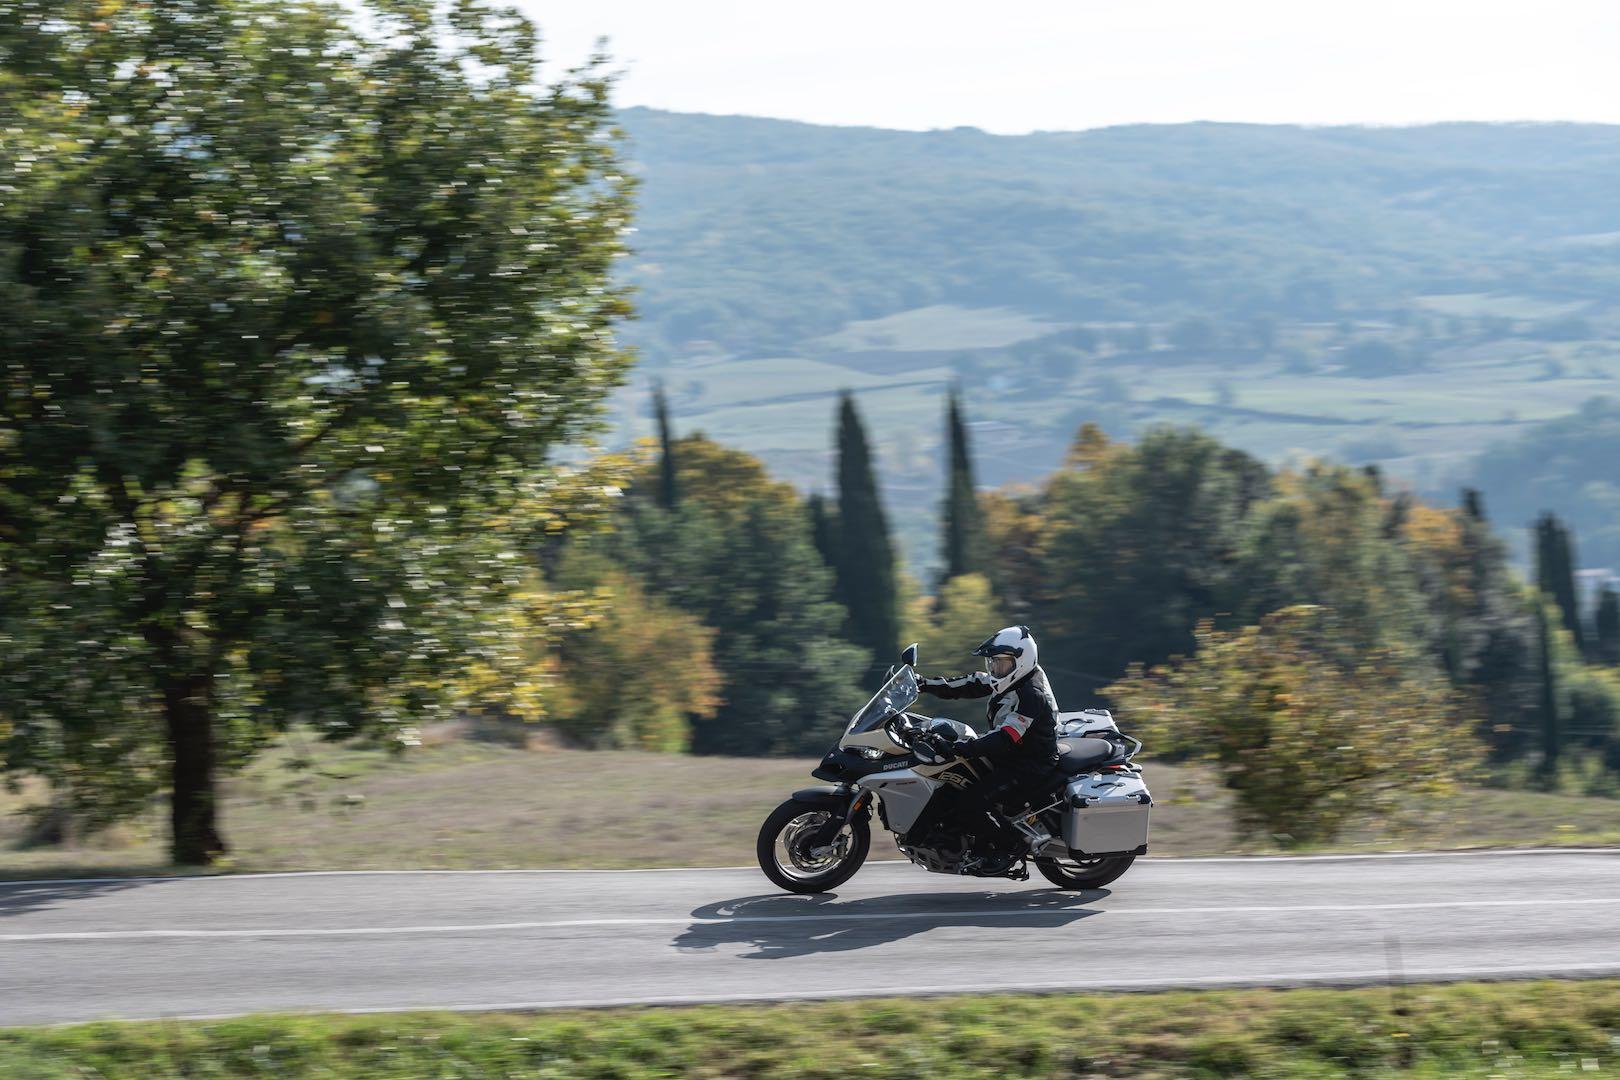 2019 Ducati Multistrada 1260 Enduro Tuscanny Review